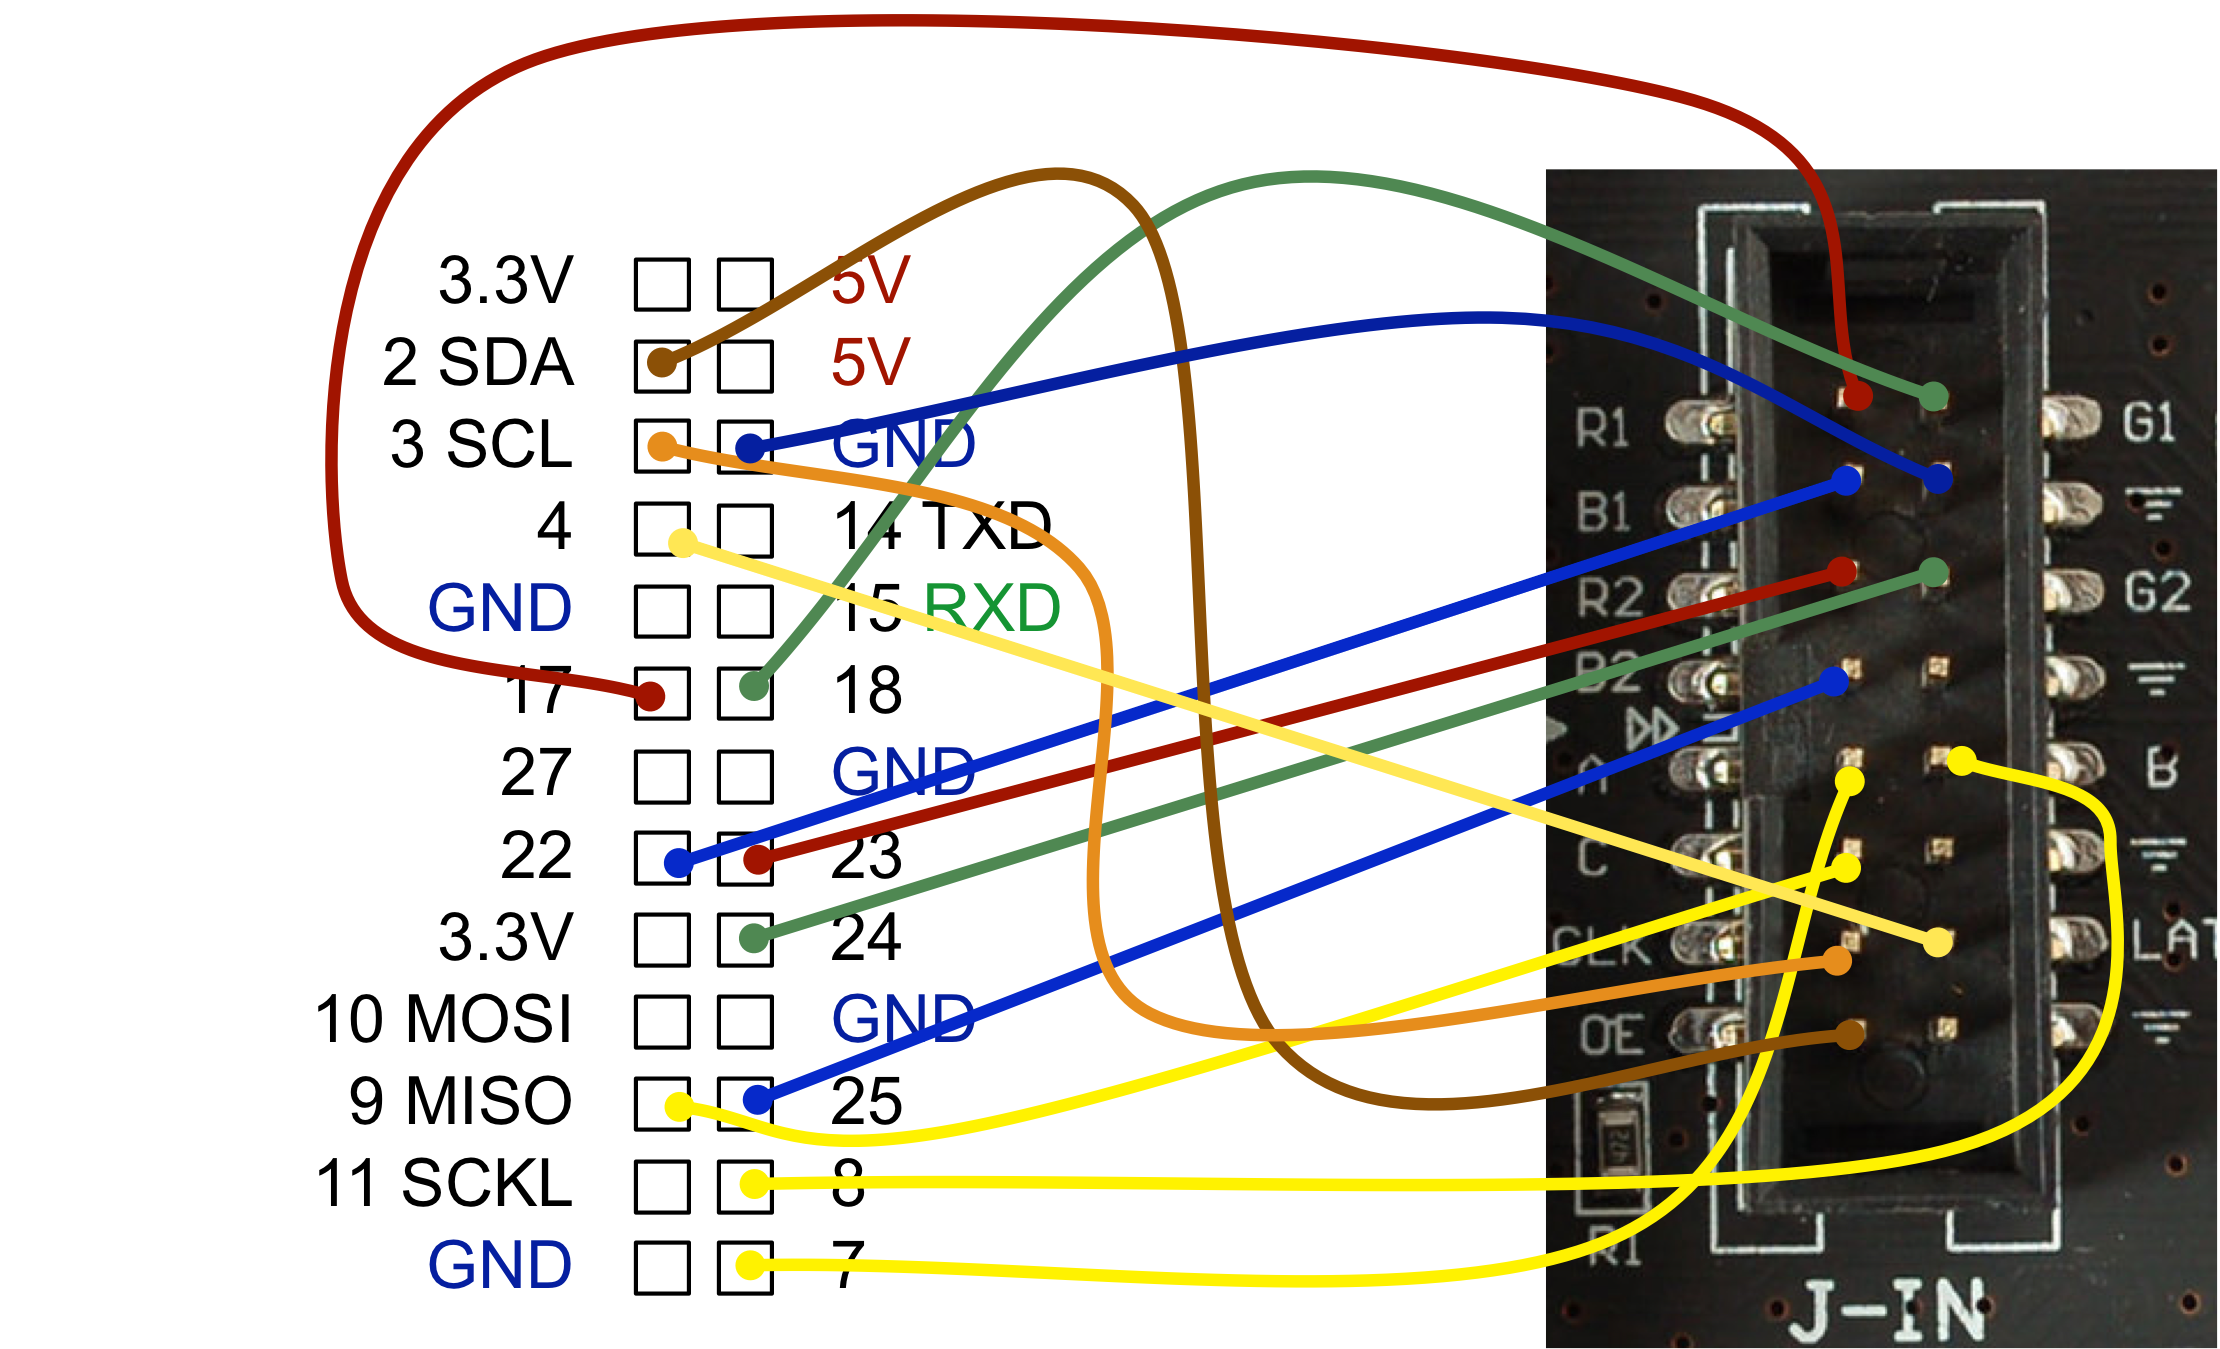 raspberry_pi_wiring_1.png